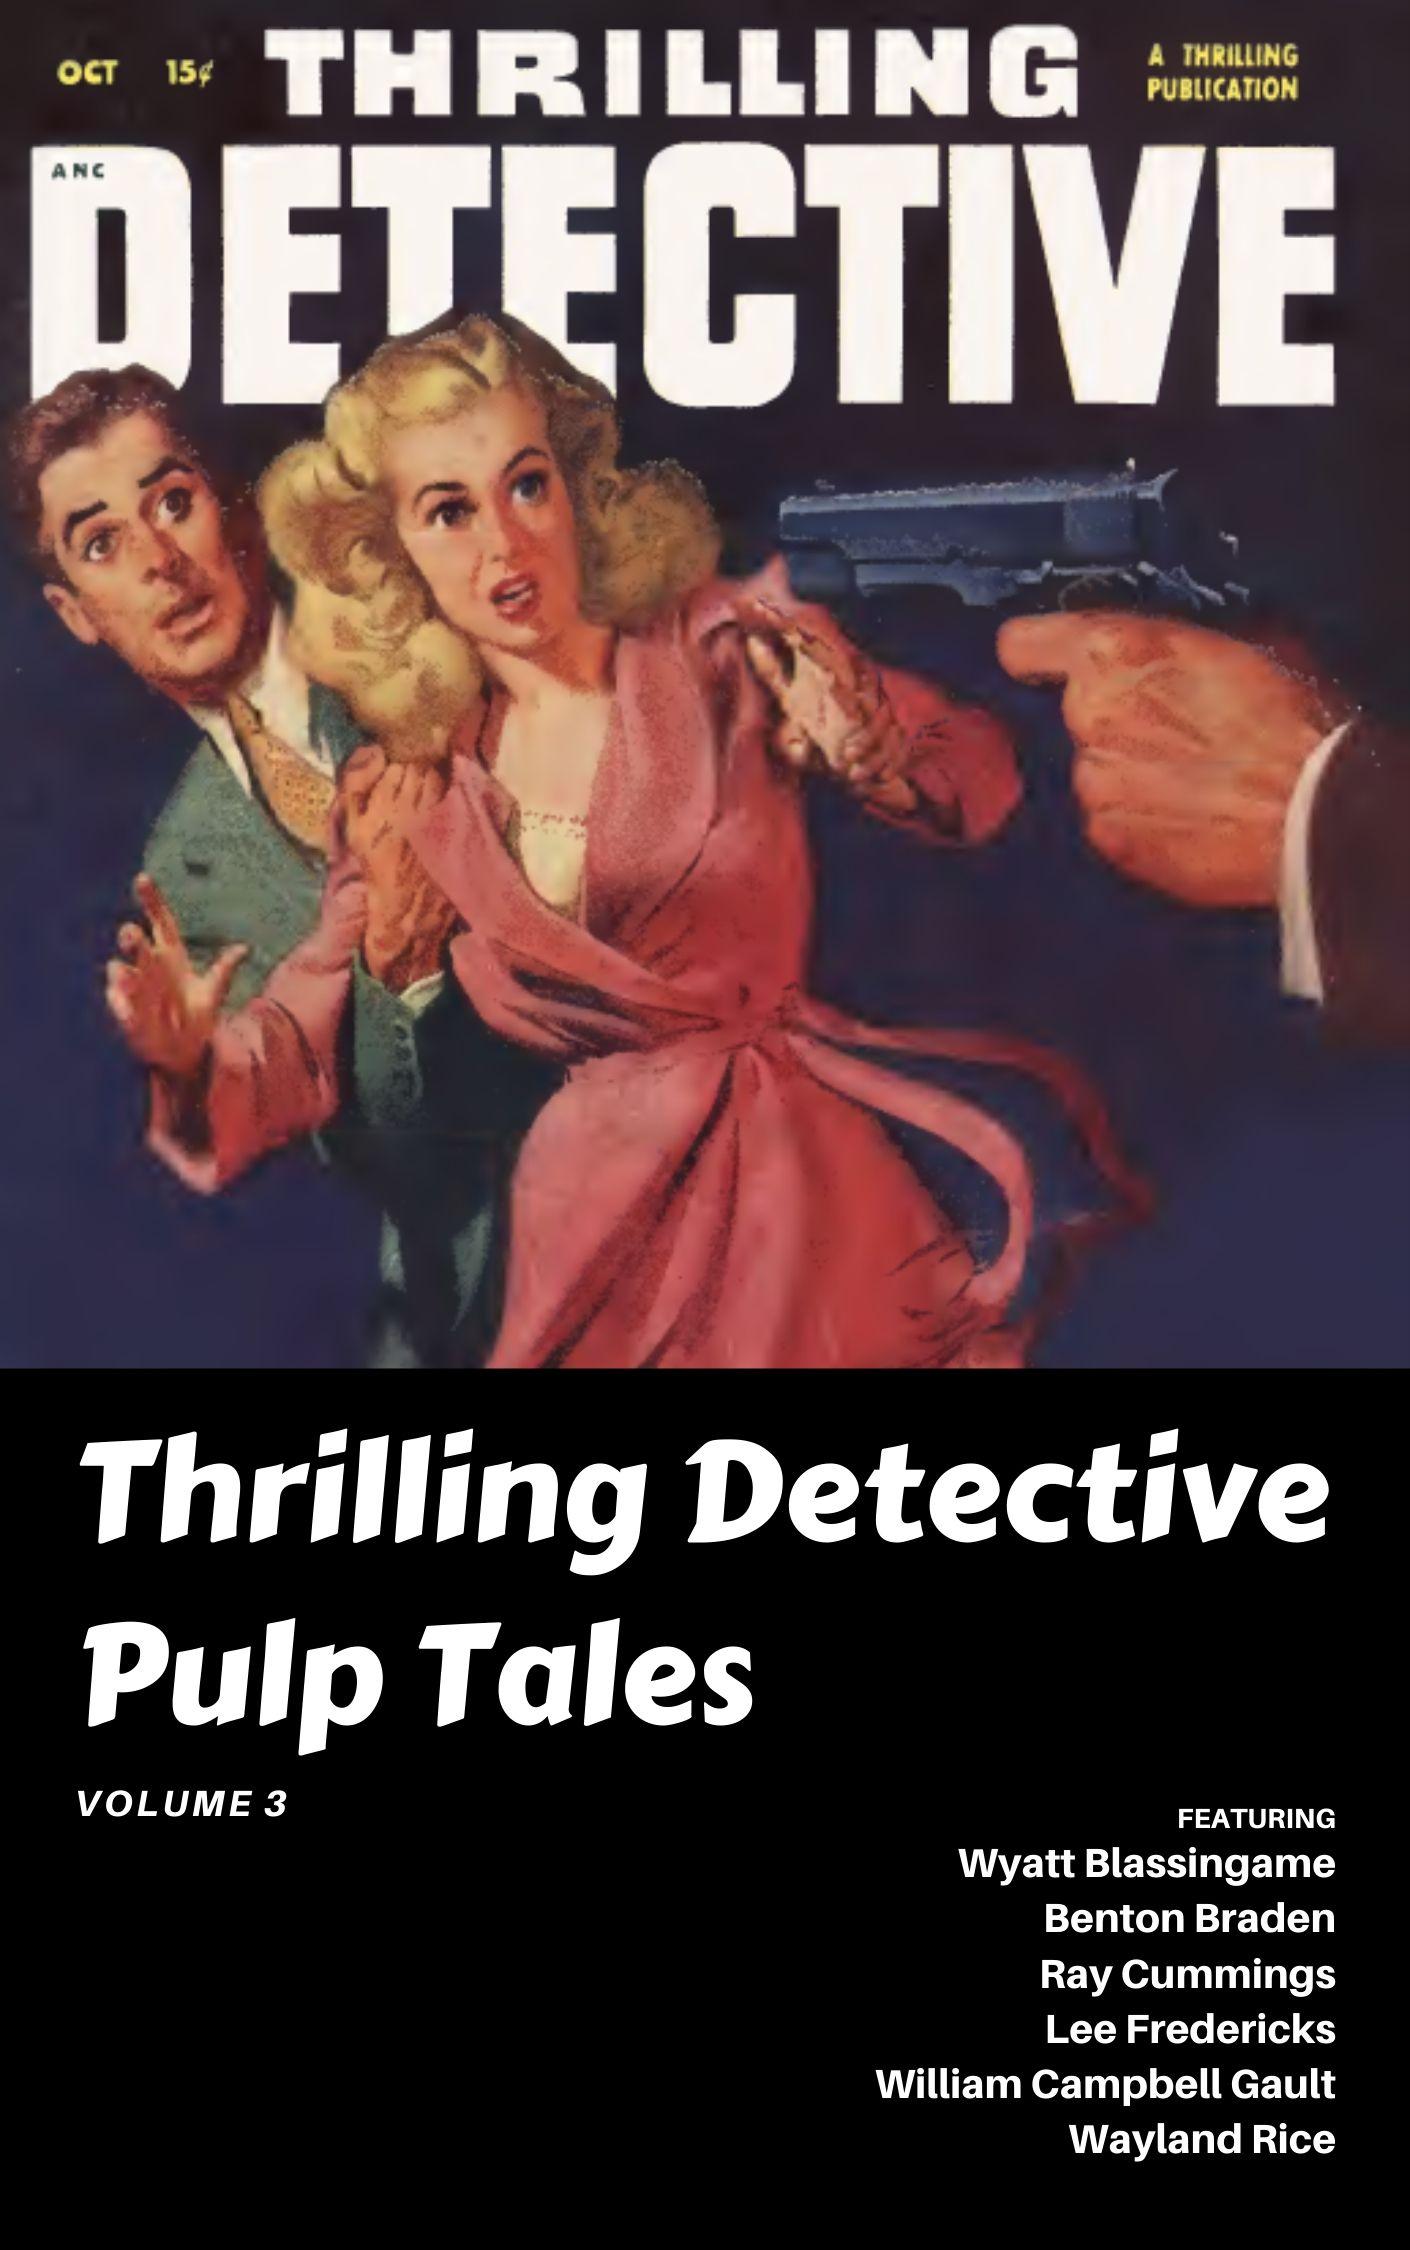 Thrilling Detective Vol. 3